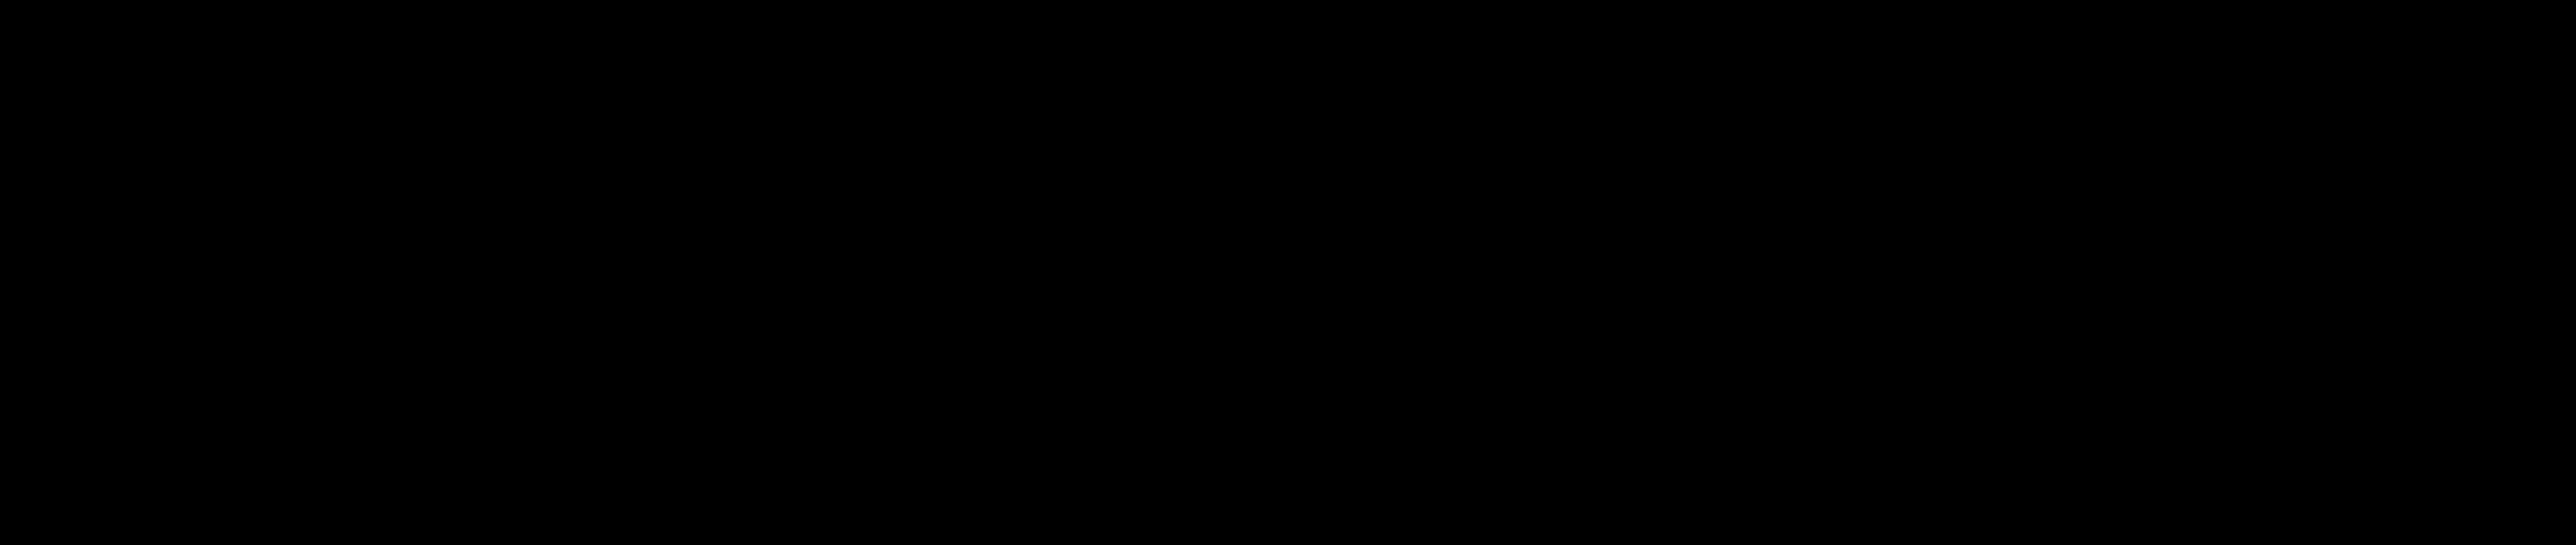 optimum nutrition logo - Optimum Nutrition Logo